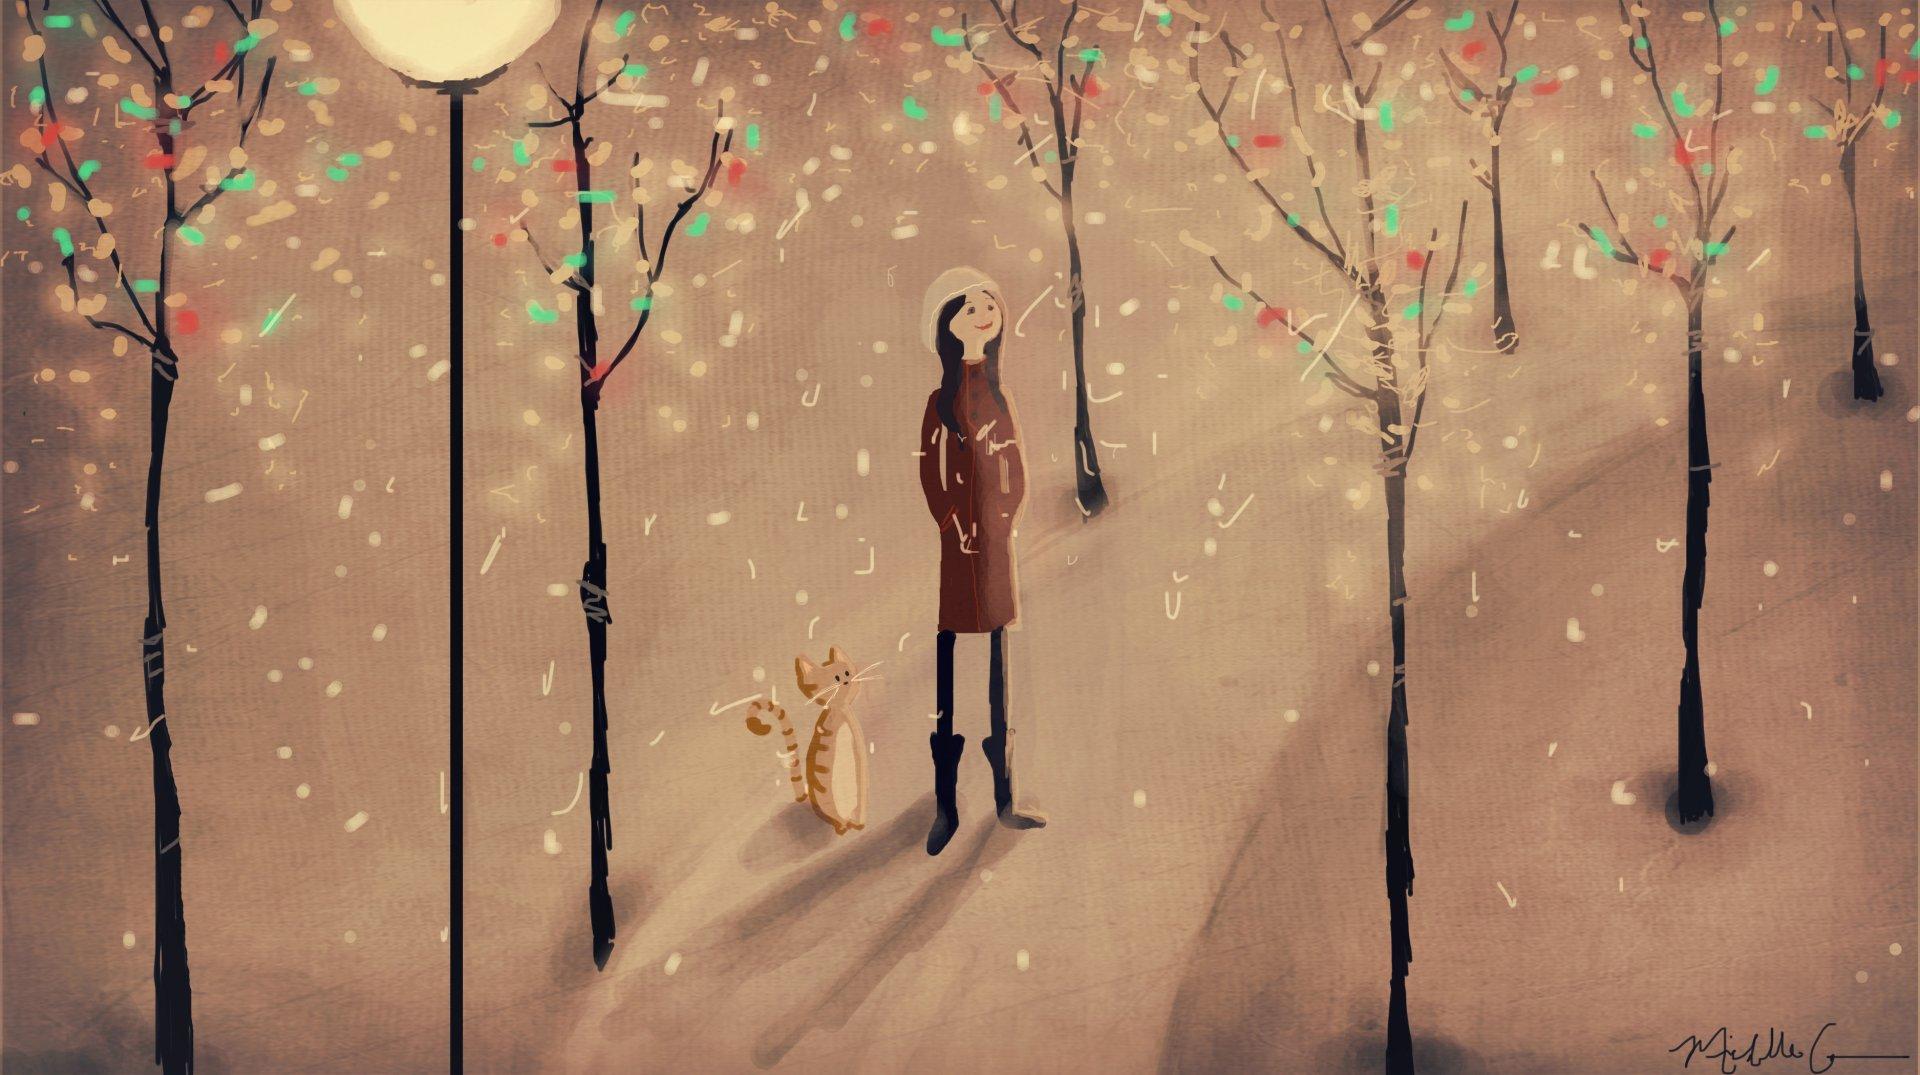 Artistic - Girl  Artistic Tree Winter Snow Cat Wallpaper